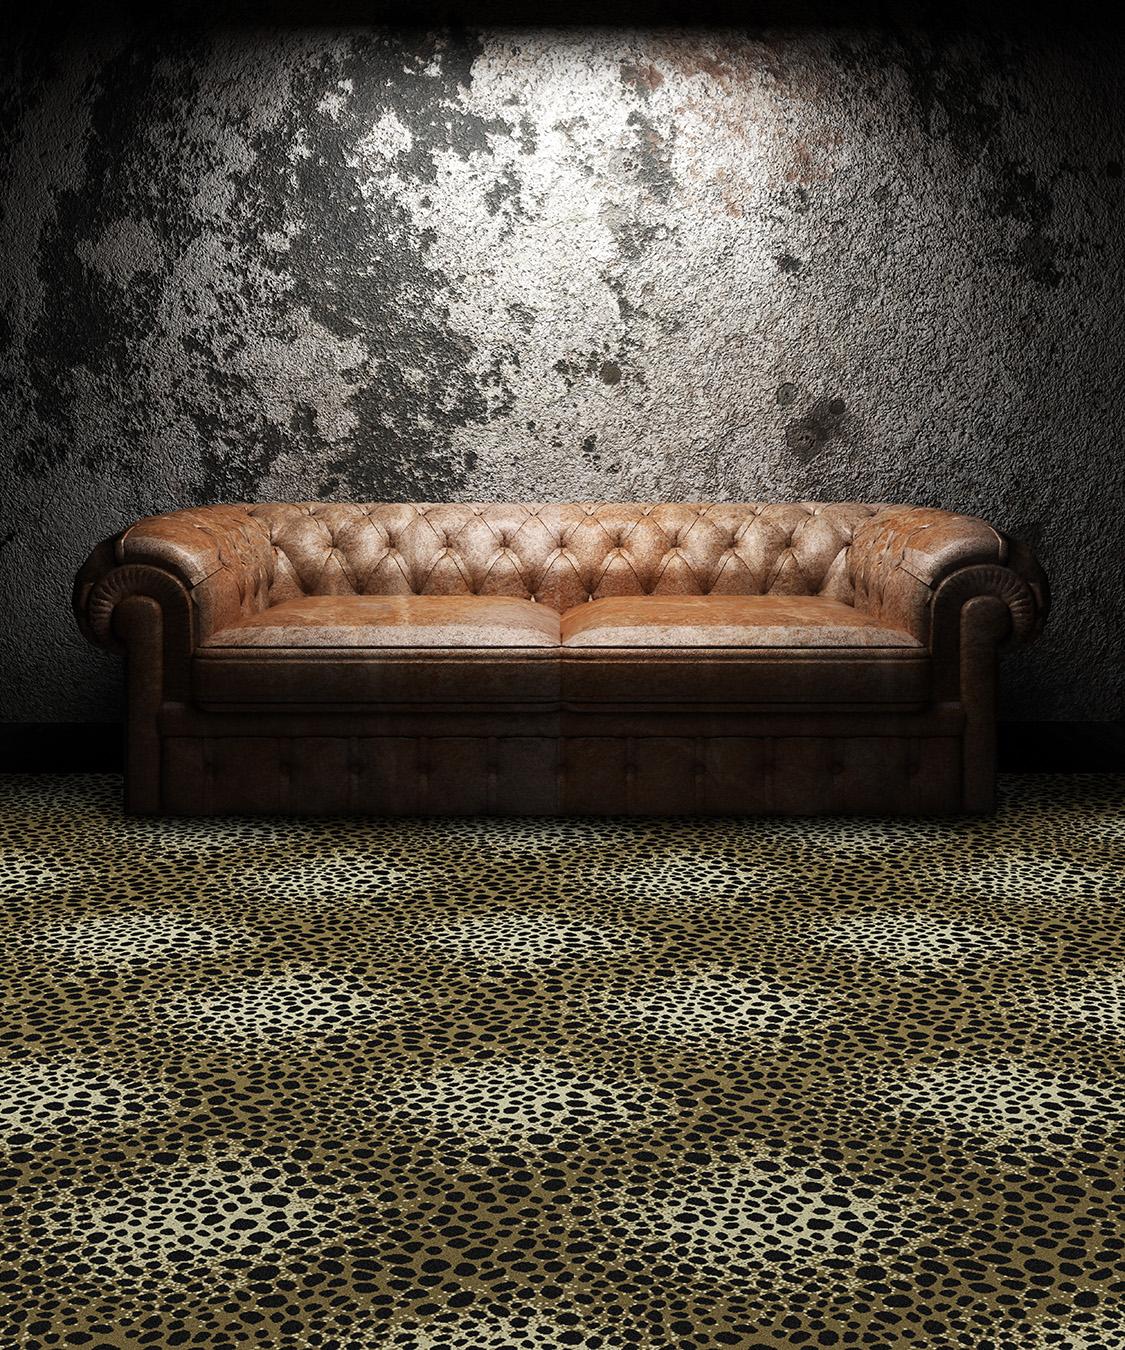 "Pattern # 5492                              Pattern Name: Leopard  Pattern Repeat: 36"" x 36""  In Stock"